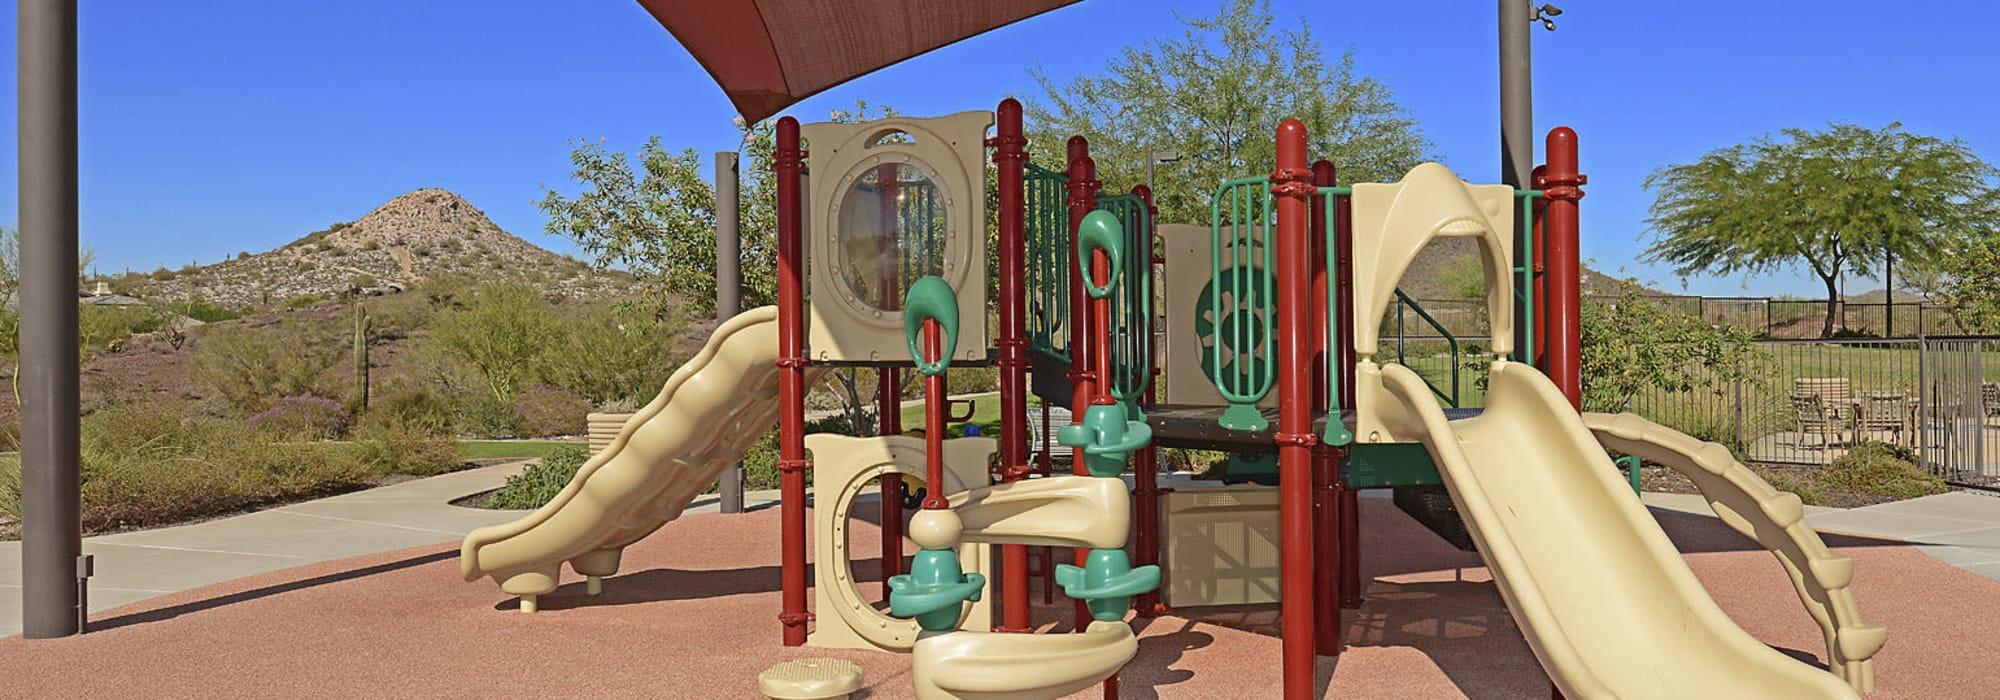 Community playground at BB Living at Vistancia in Peoria, Arizona